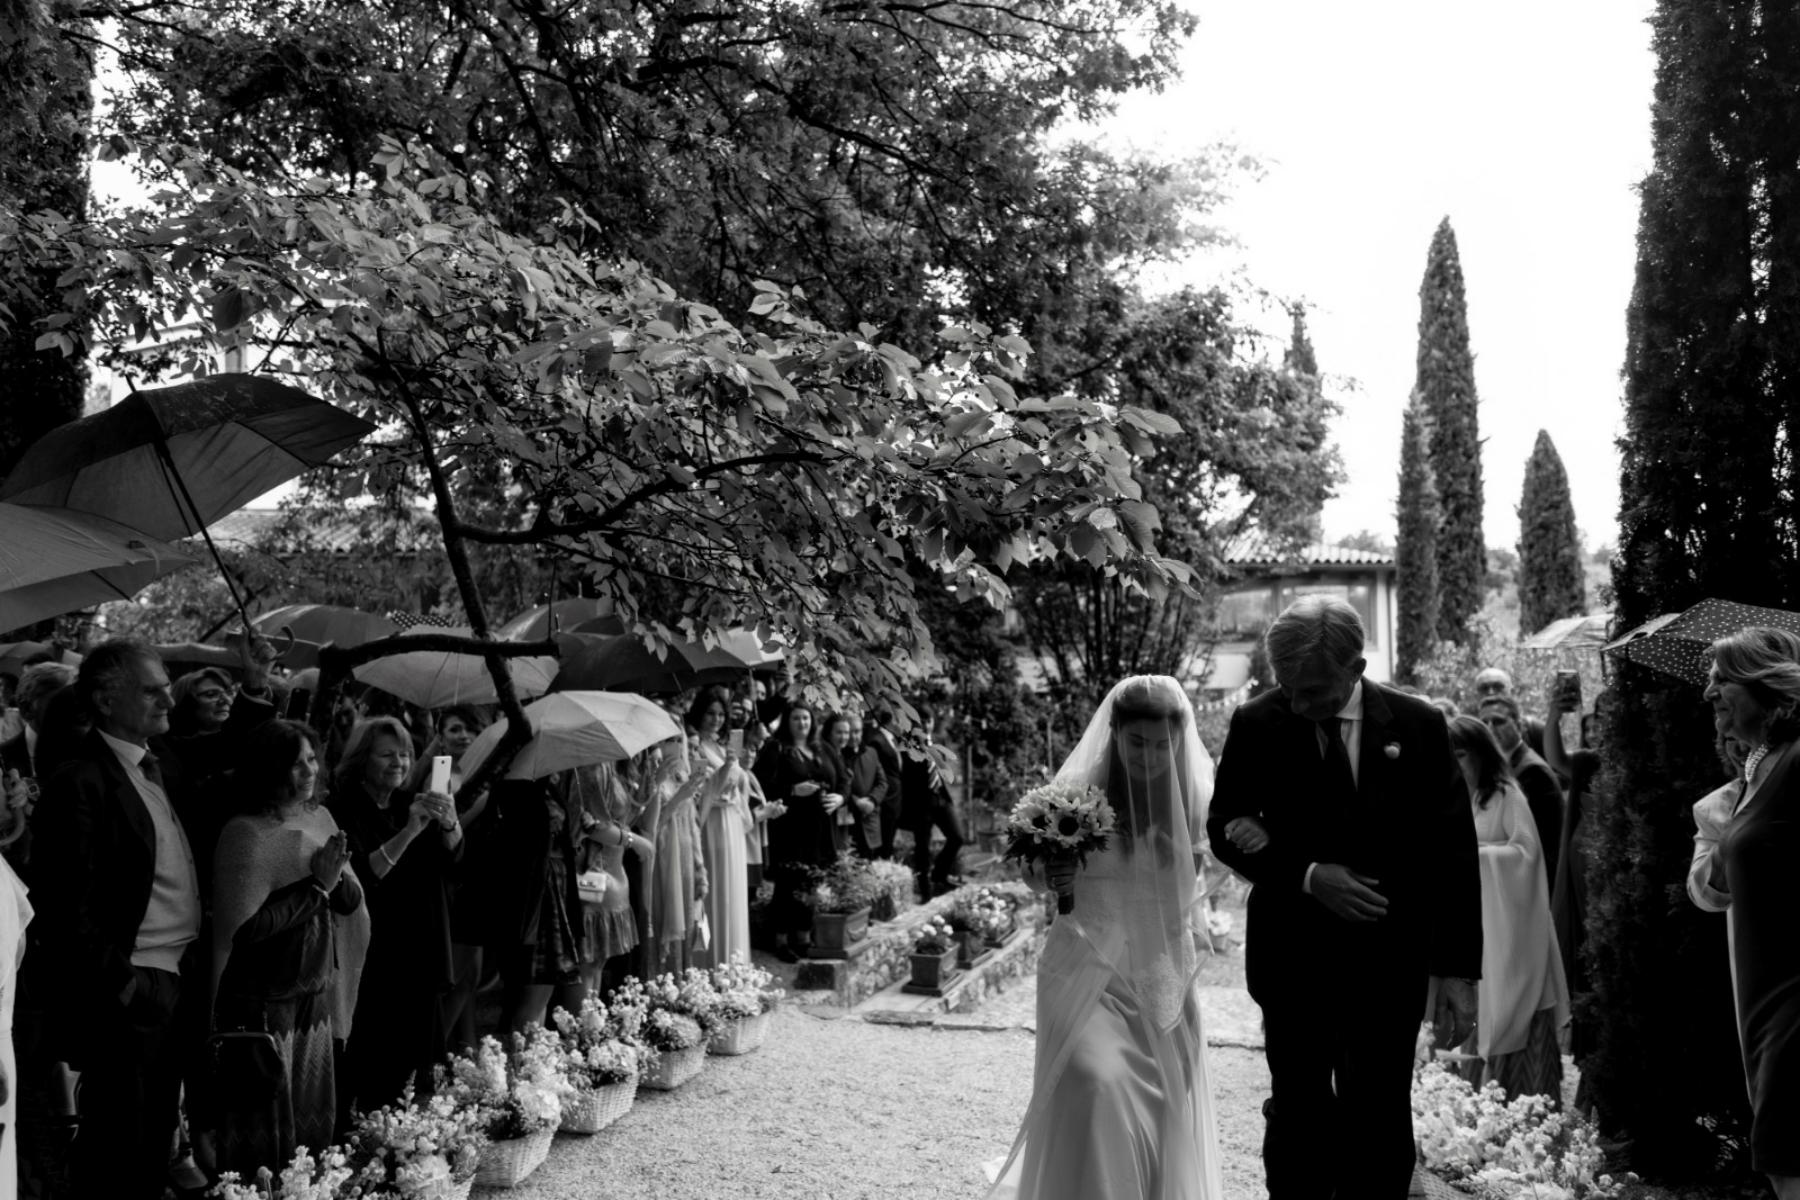 matrimonioincampagna_casalerario_blineventi-29